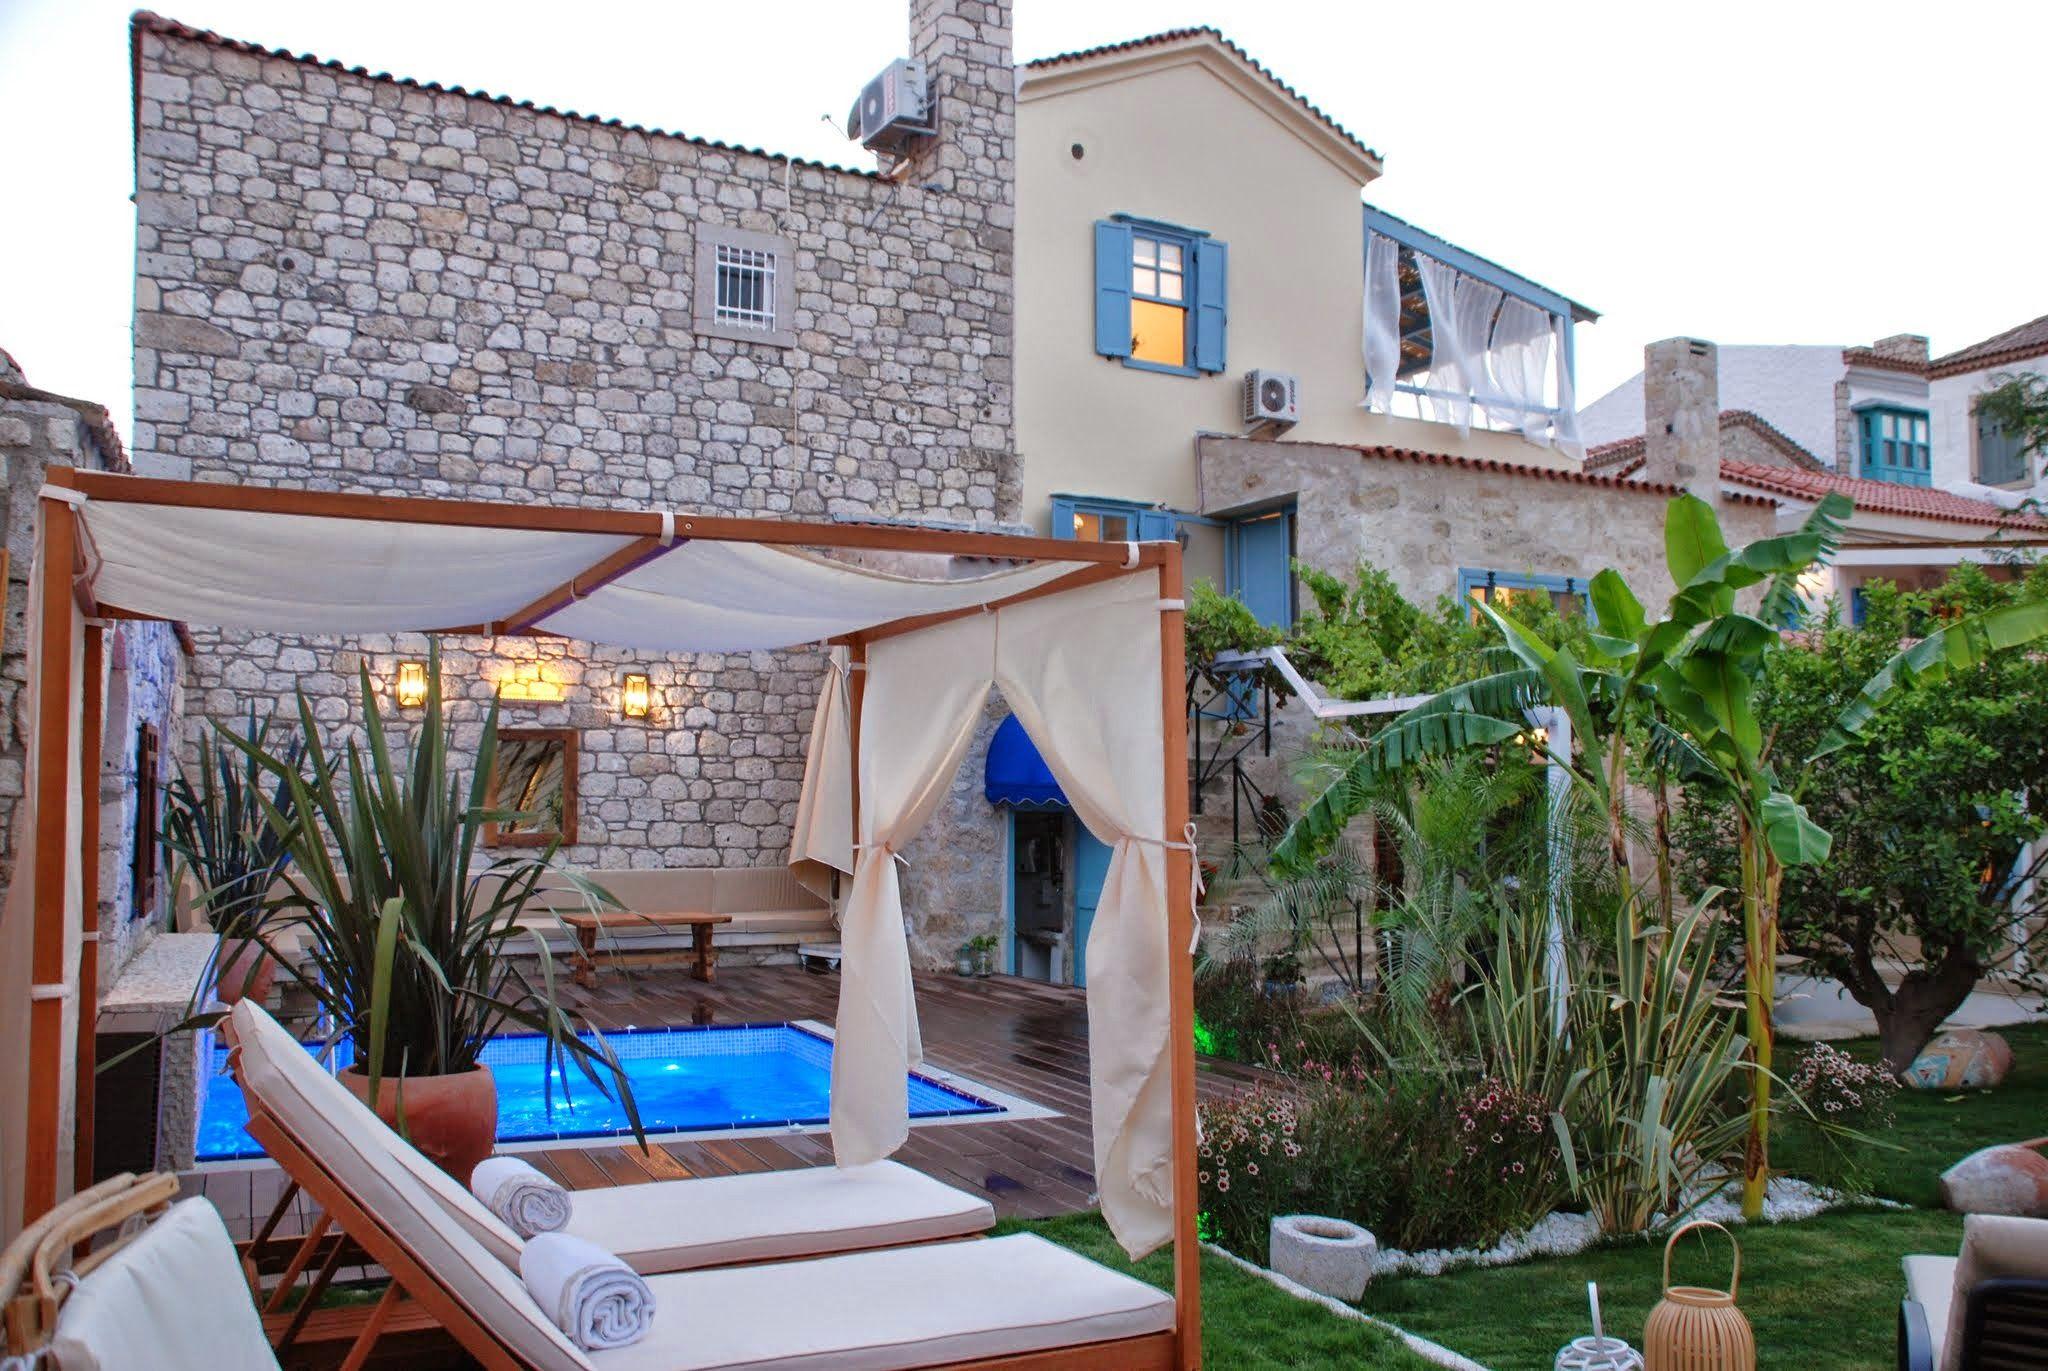 Charmant Canopy, Garden Design, Hotel Gardens, Jacuzzi, Traditional House, Aegean  Dreams,